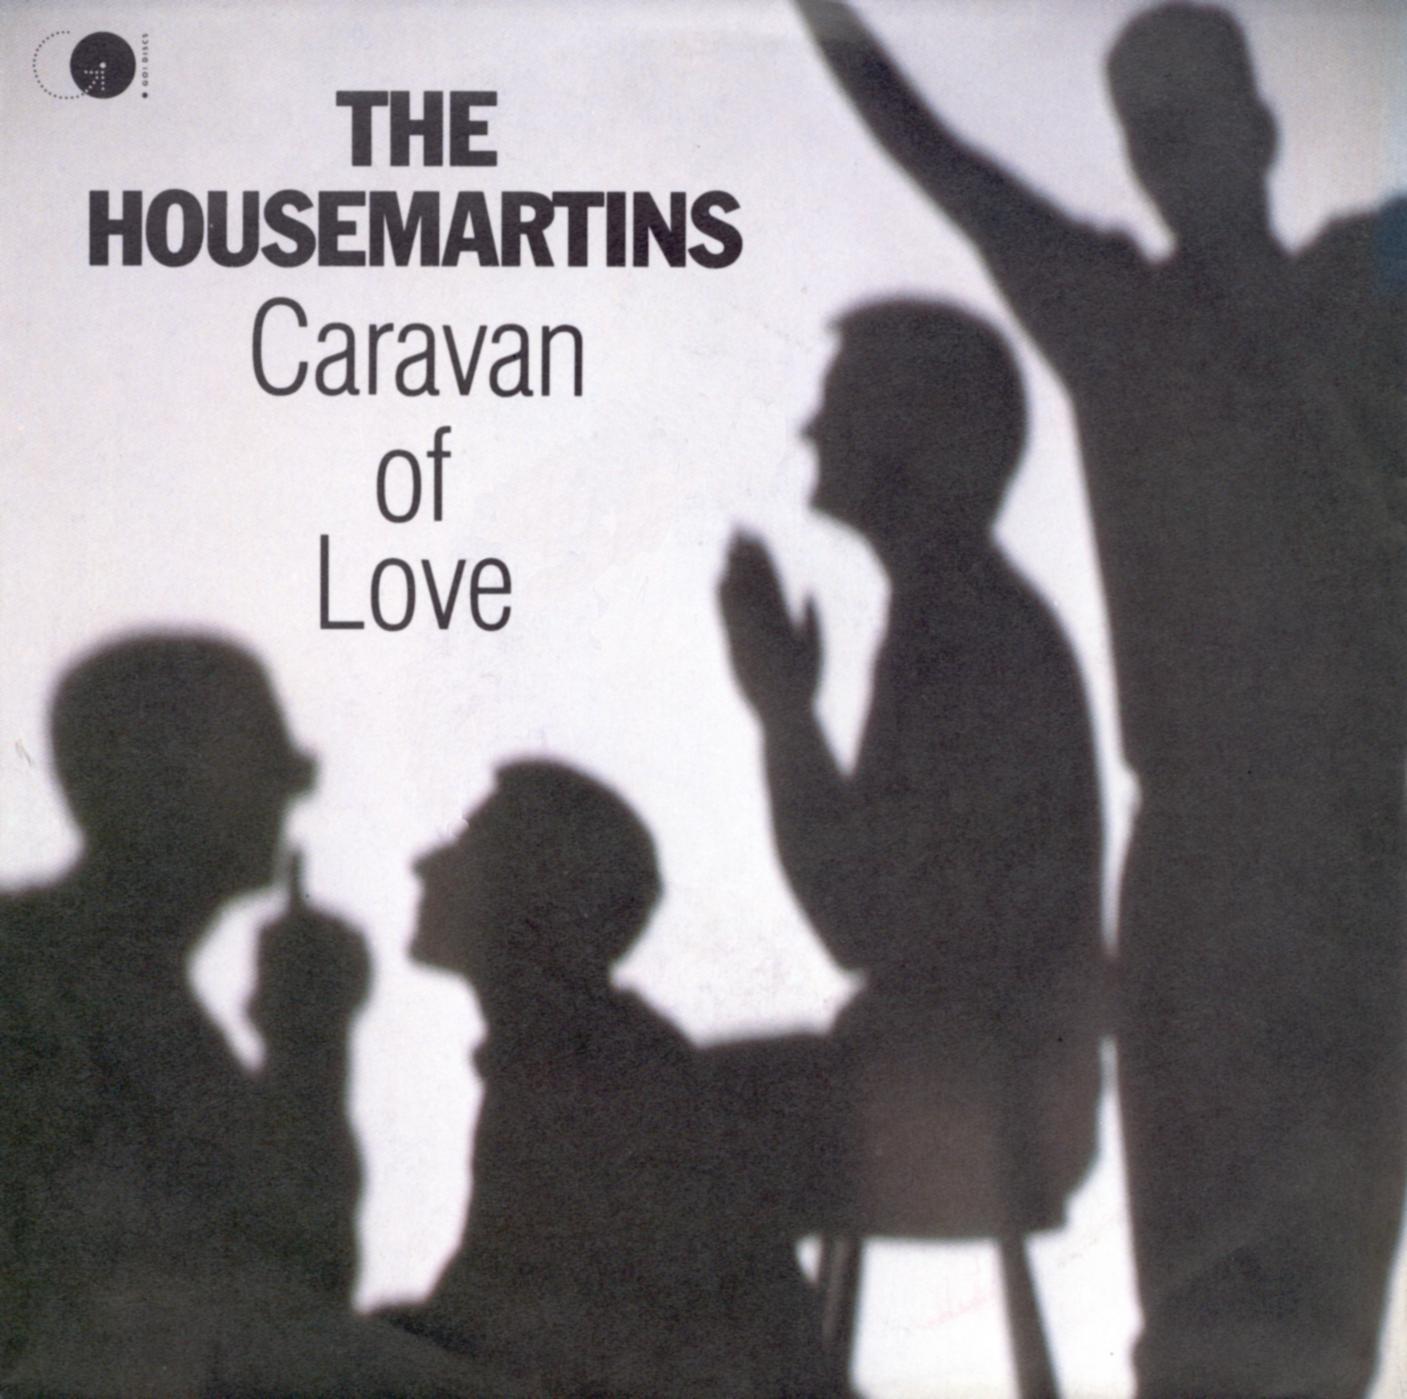 Caravan of love (Foto: The Housemartins)